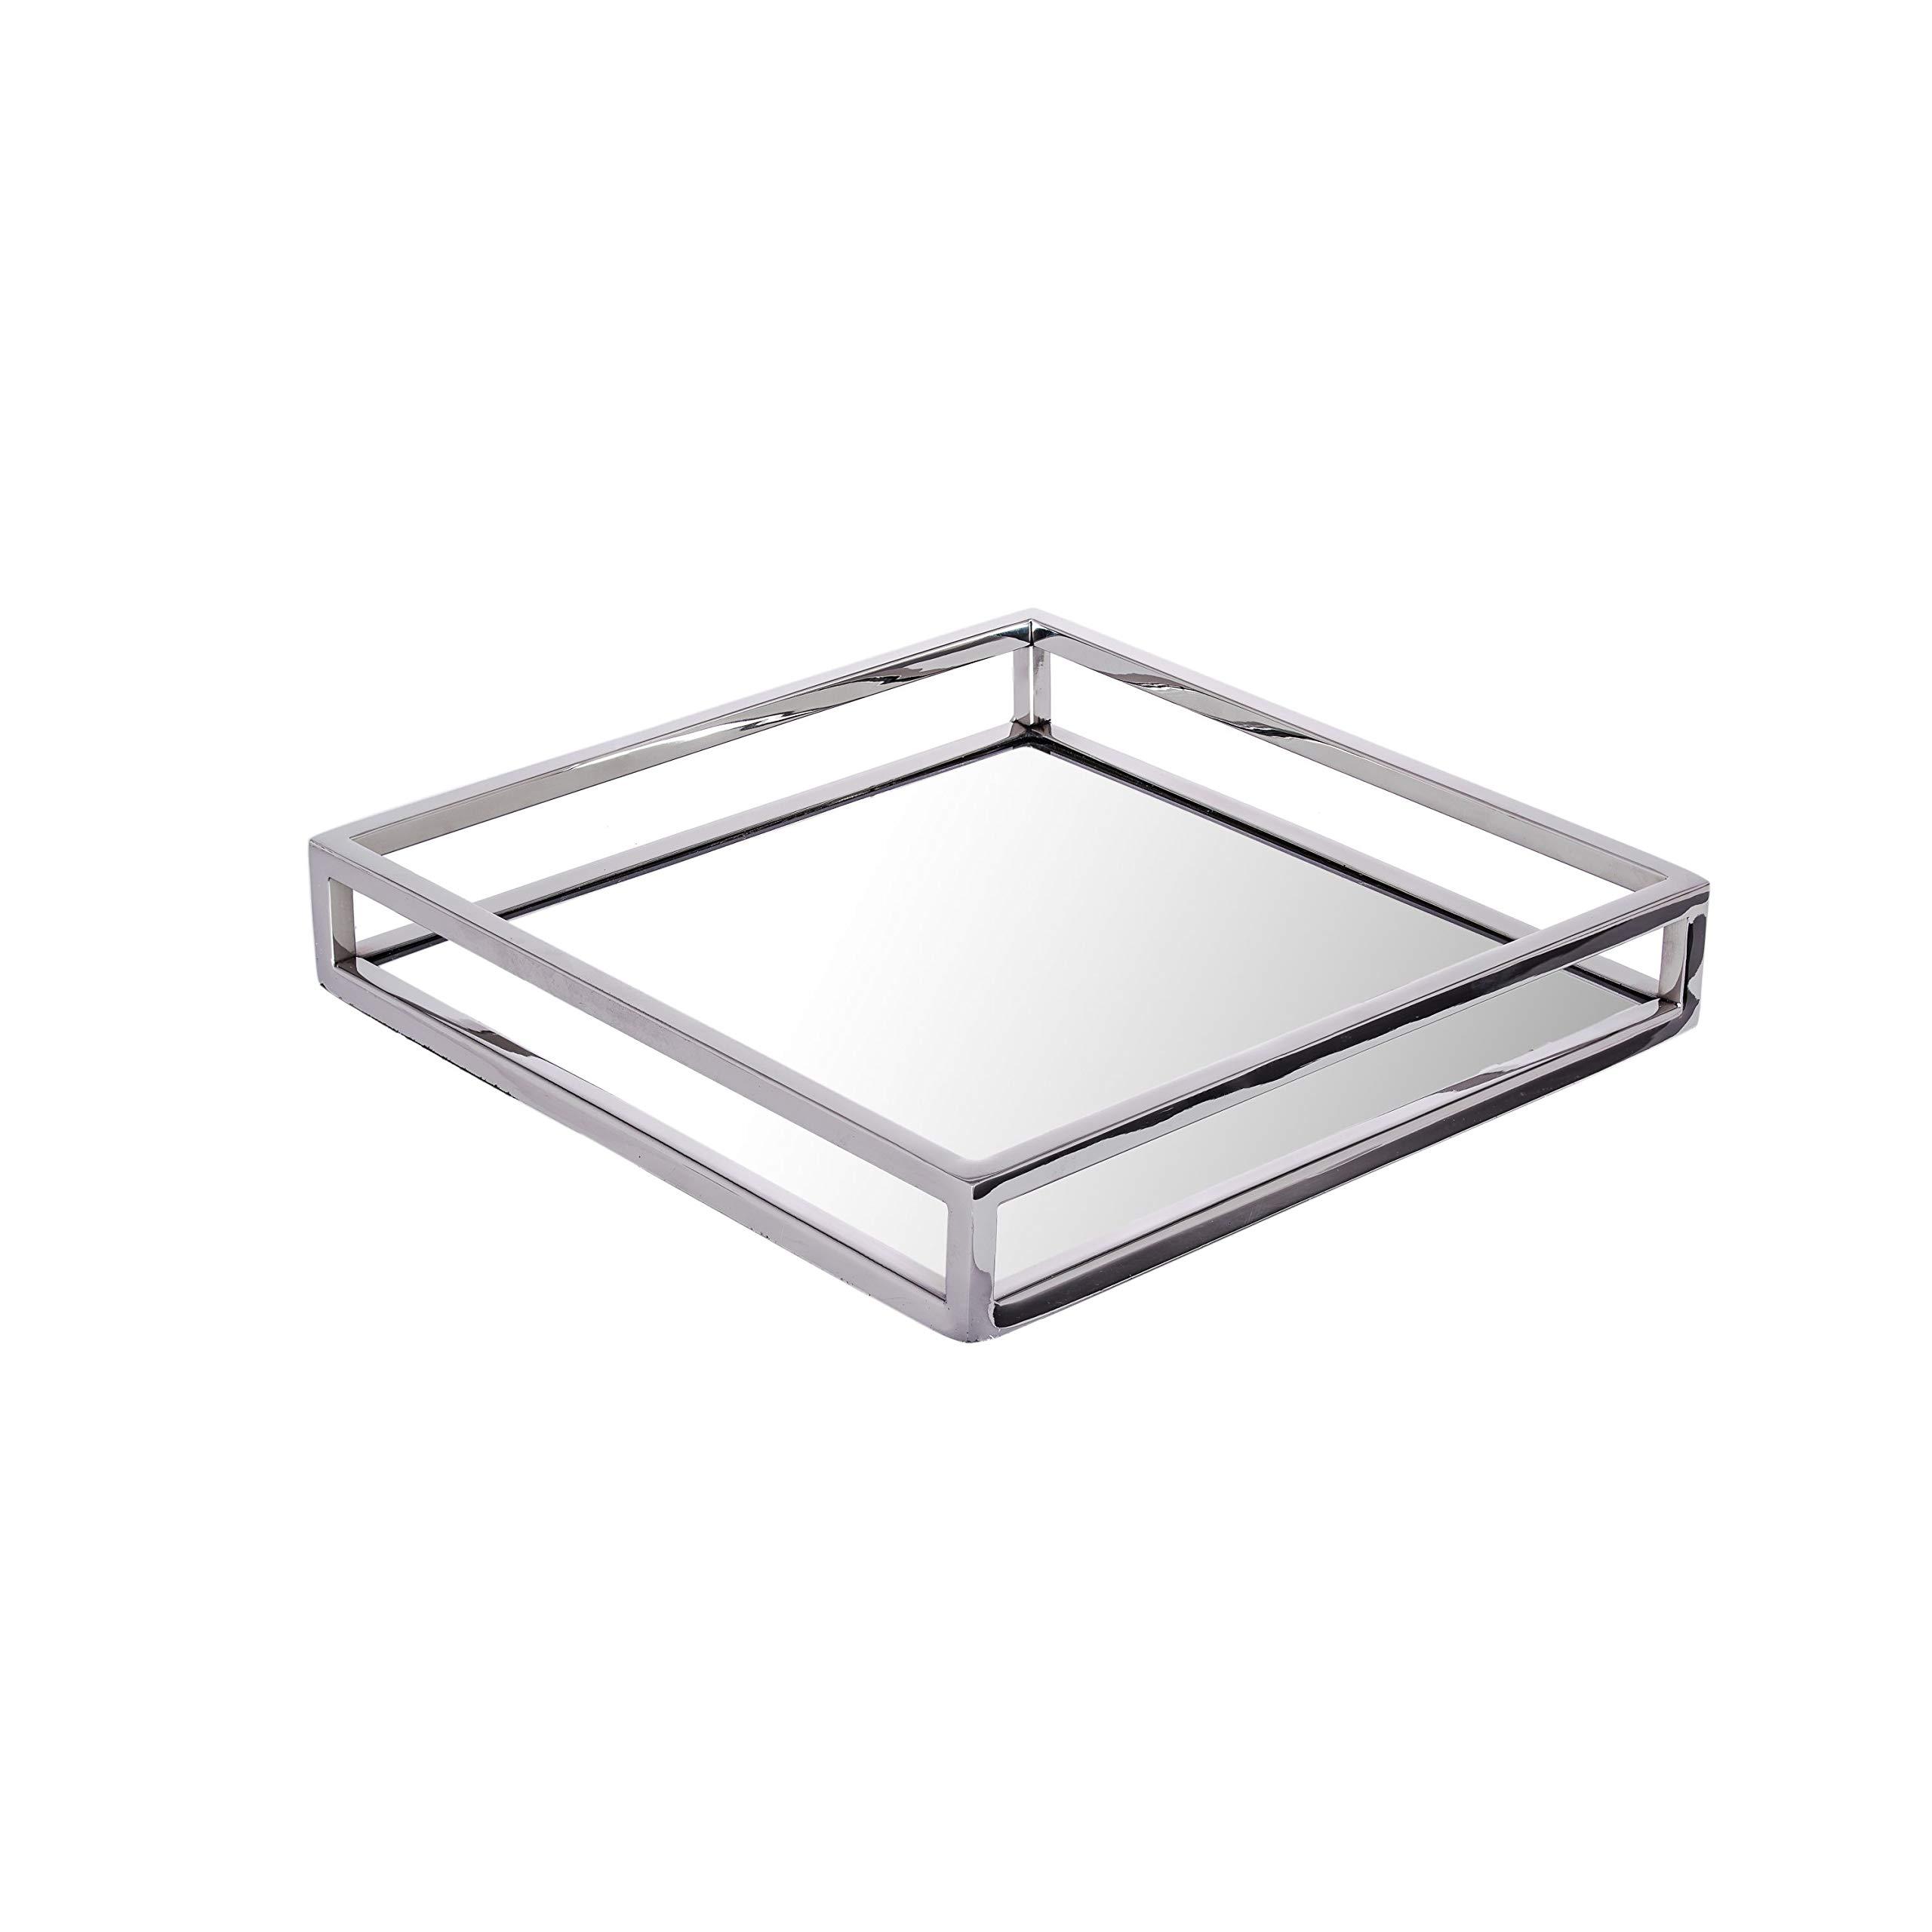 Pizzaz Beautiful Rectangular,Vanity Mirror Tray 12x12x2